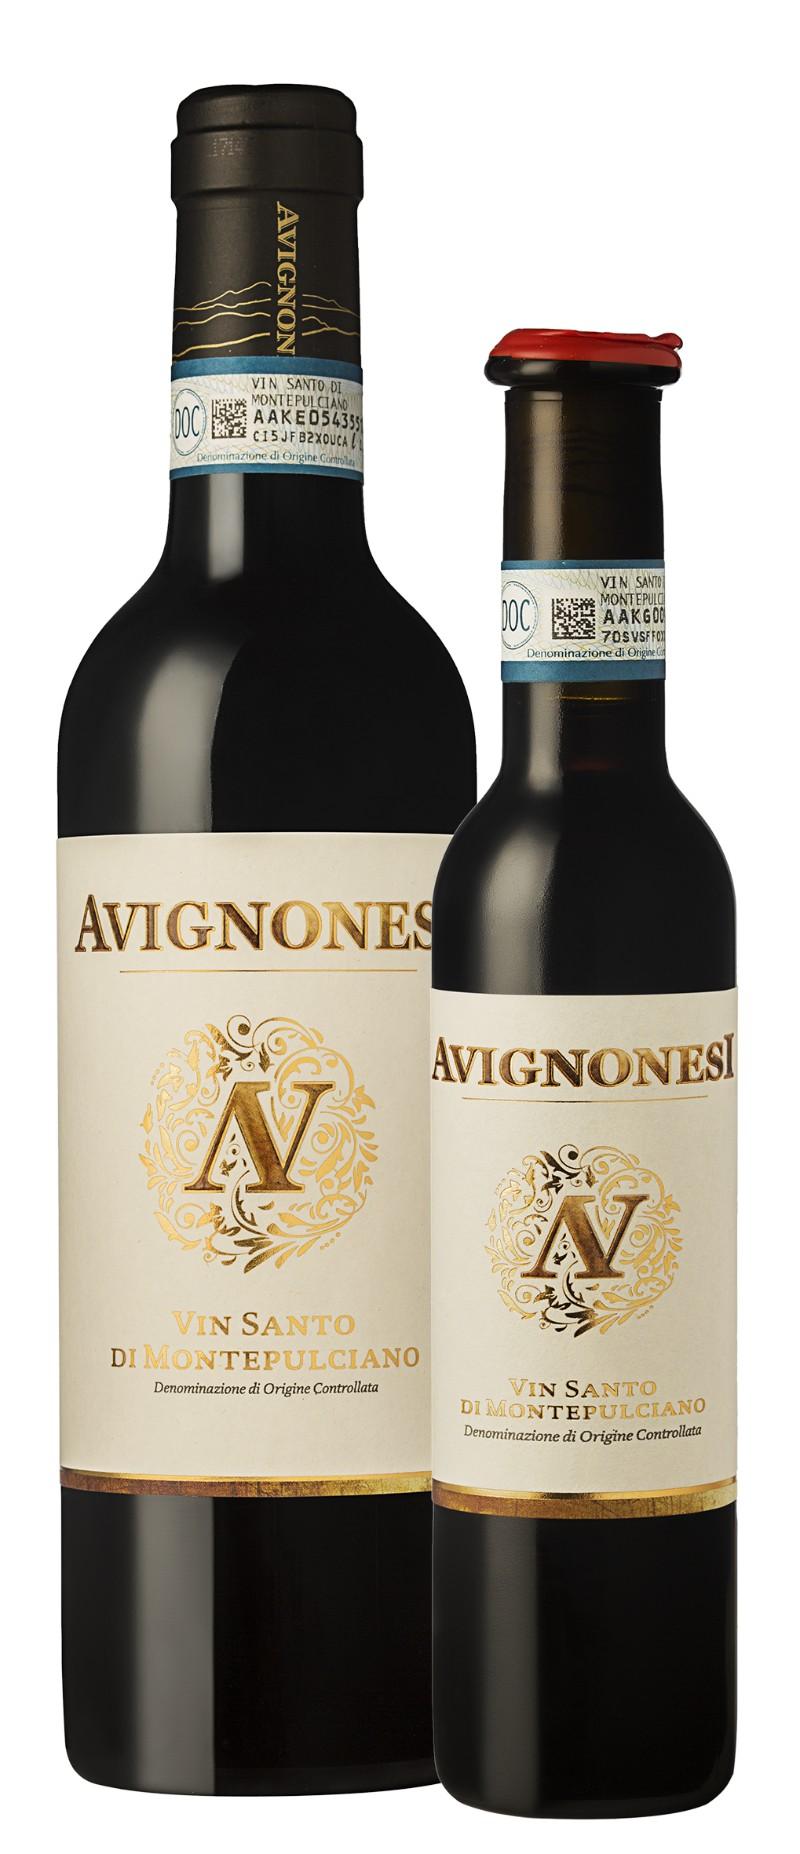 10 Italian Expensive Wines expensive wines 10 Italian Expensive Wines 10 Italian Expensive Wines 1